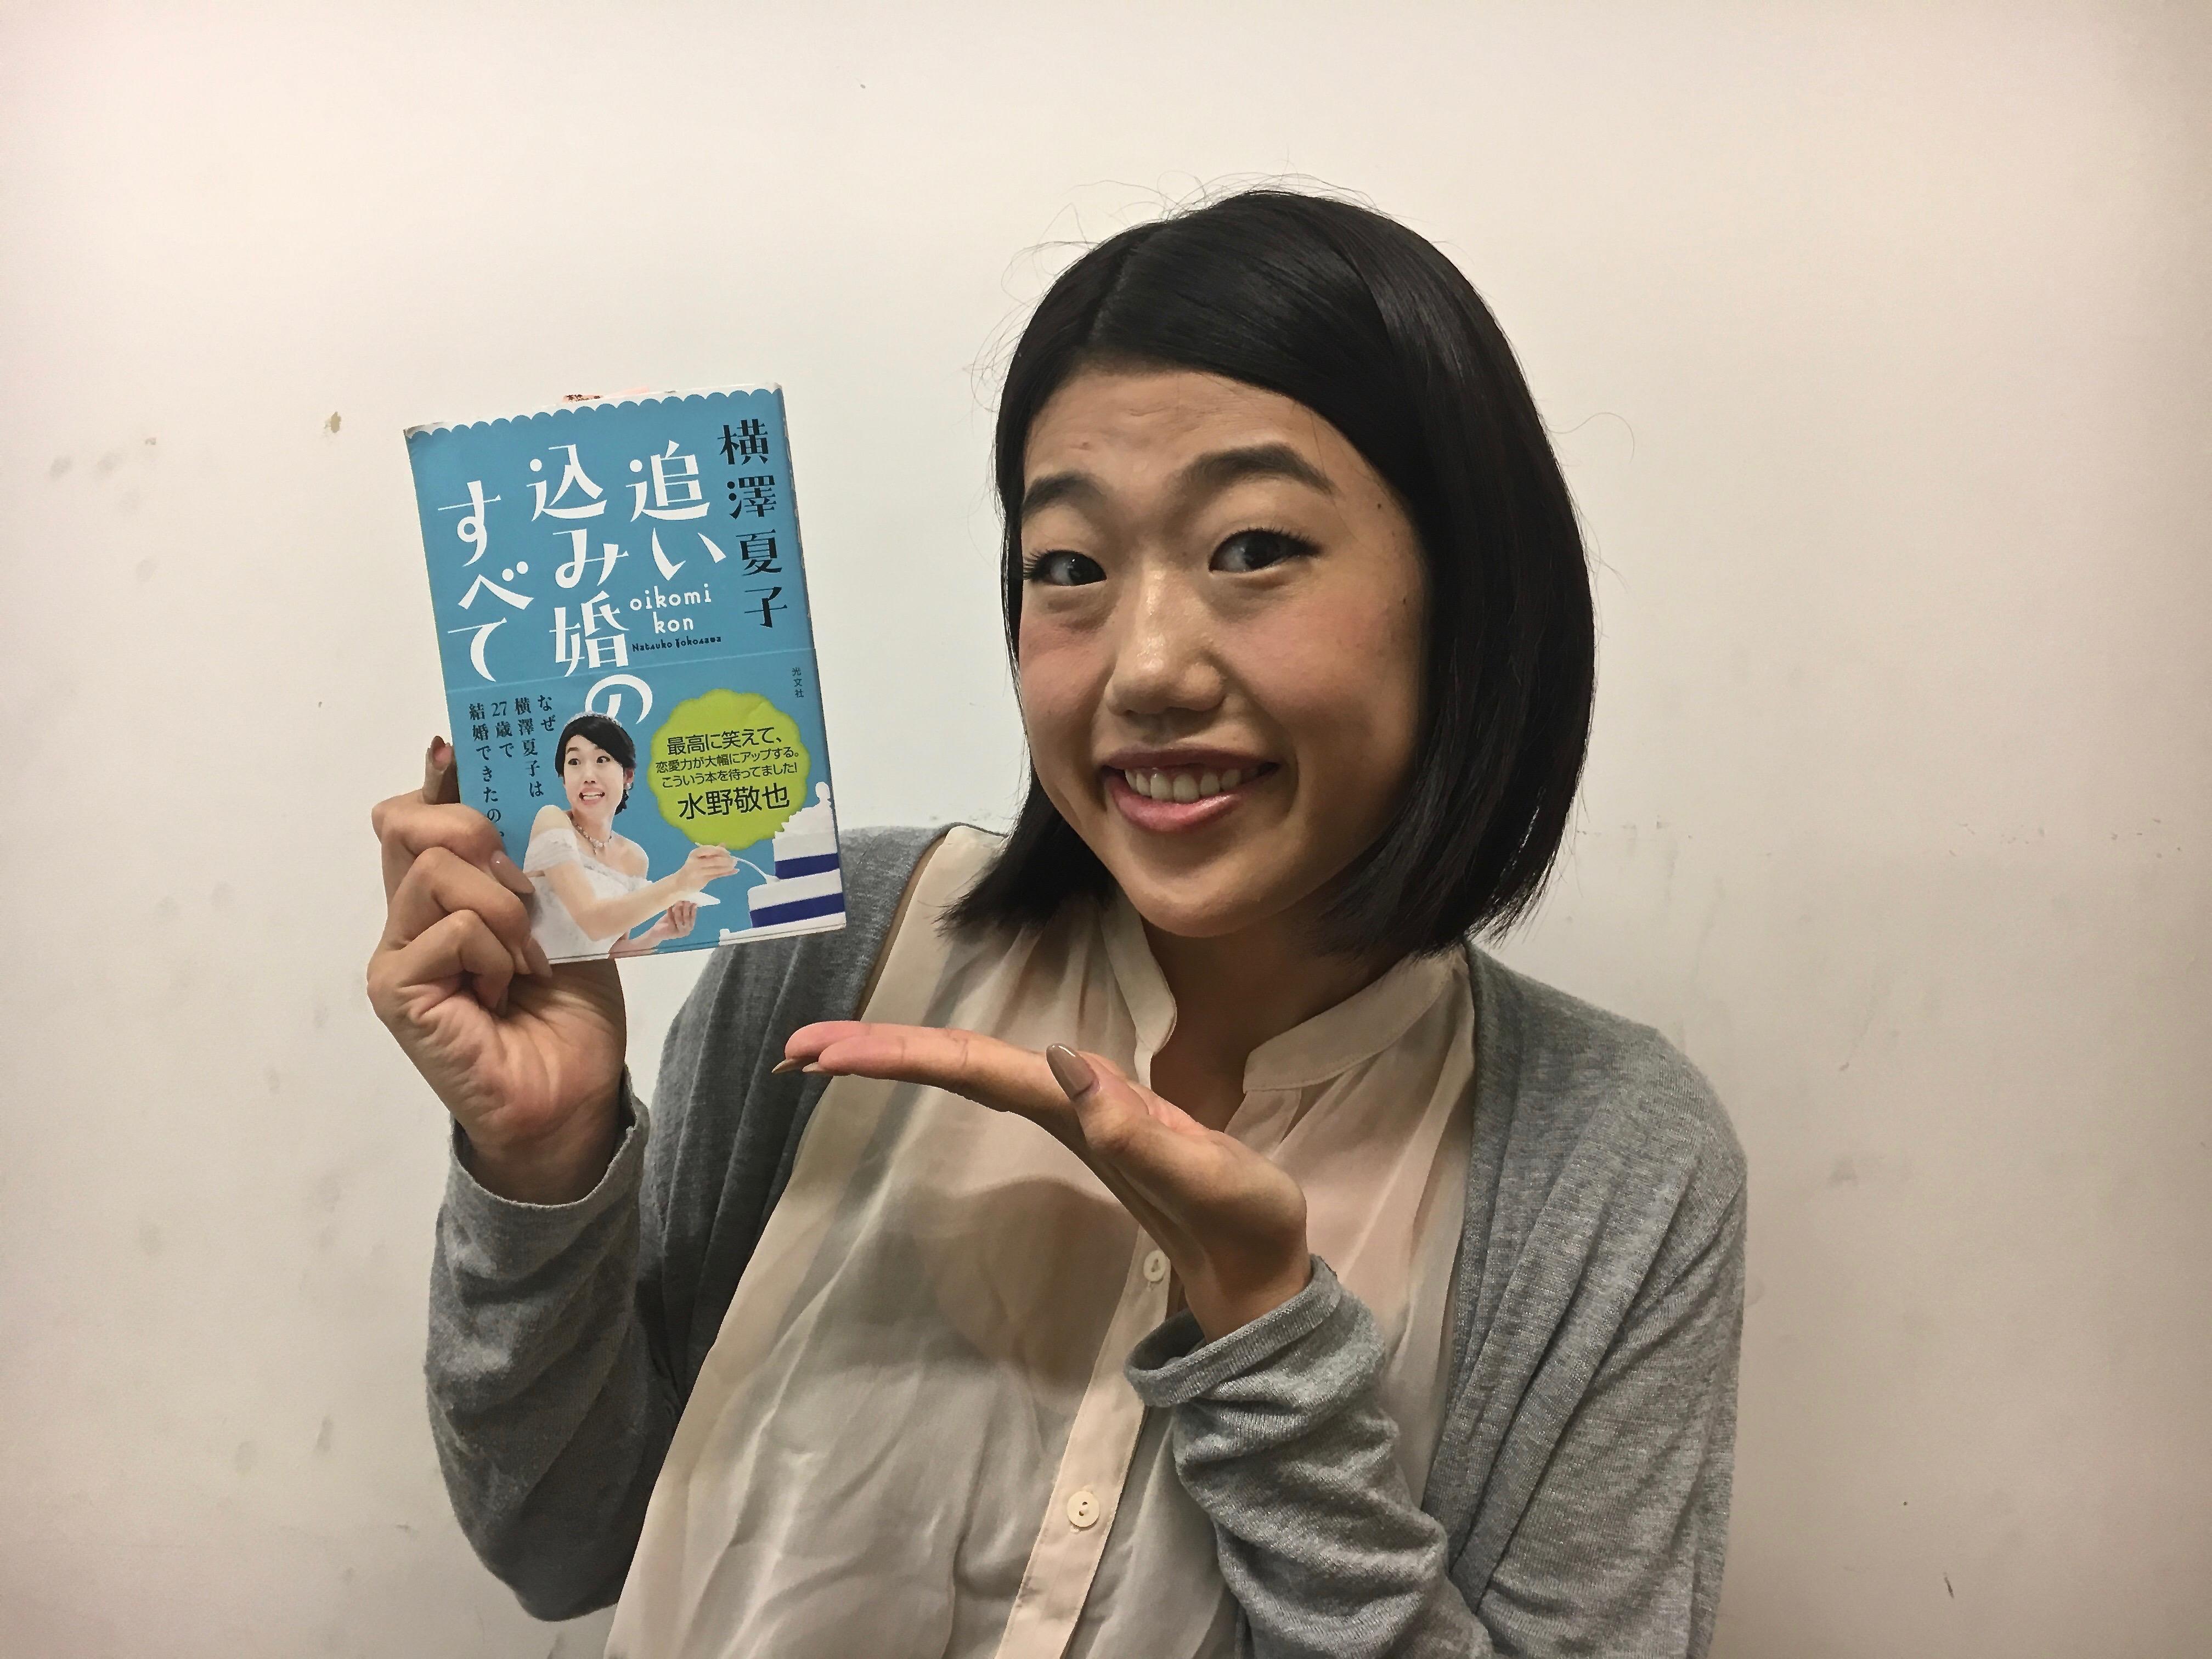 http://news.yoshimoto.co.jp/20180731201249-763906d722e7033203352ef9378c03c0469a2054.jpg